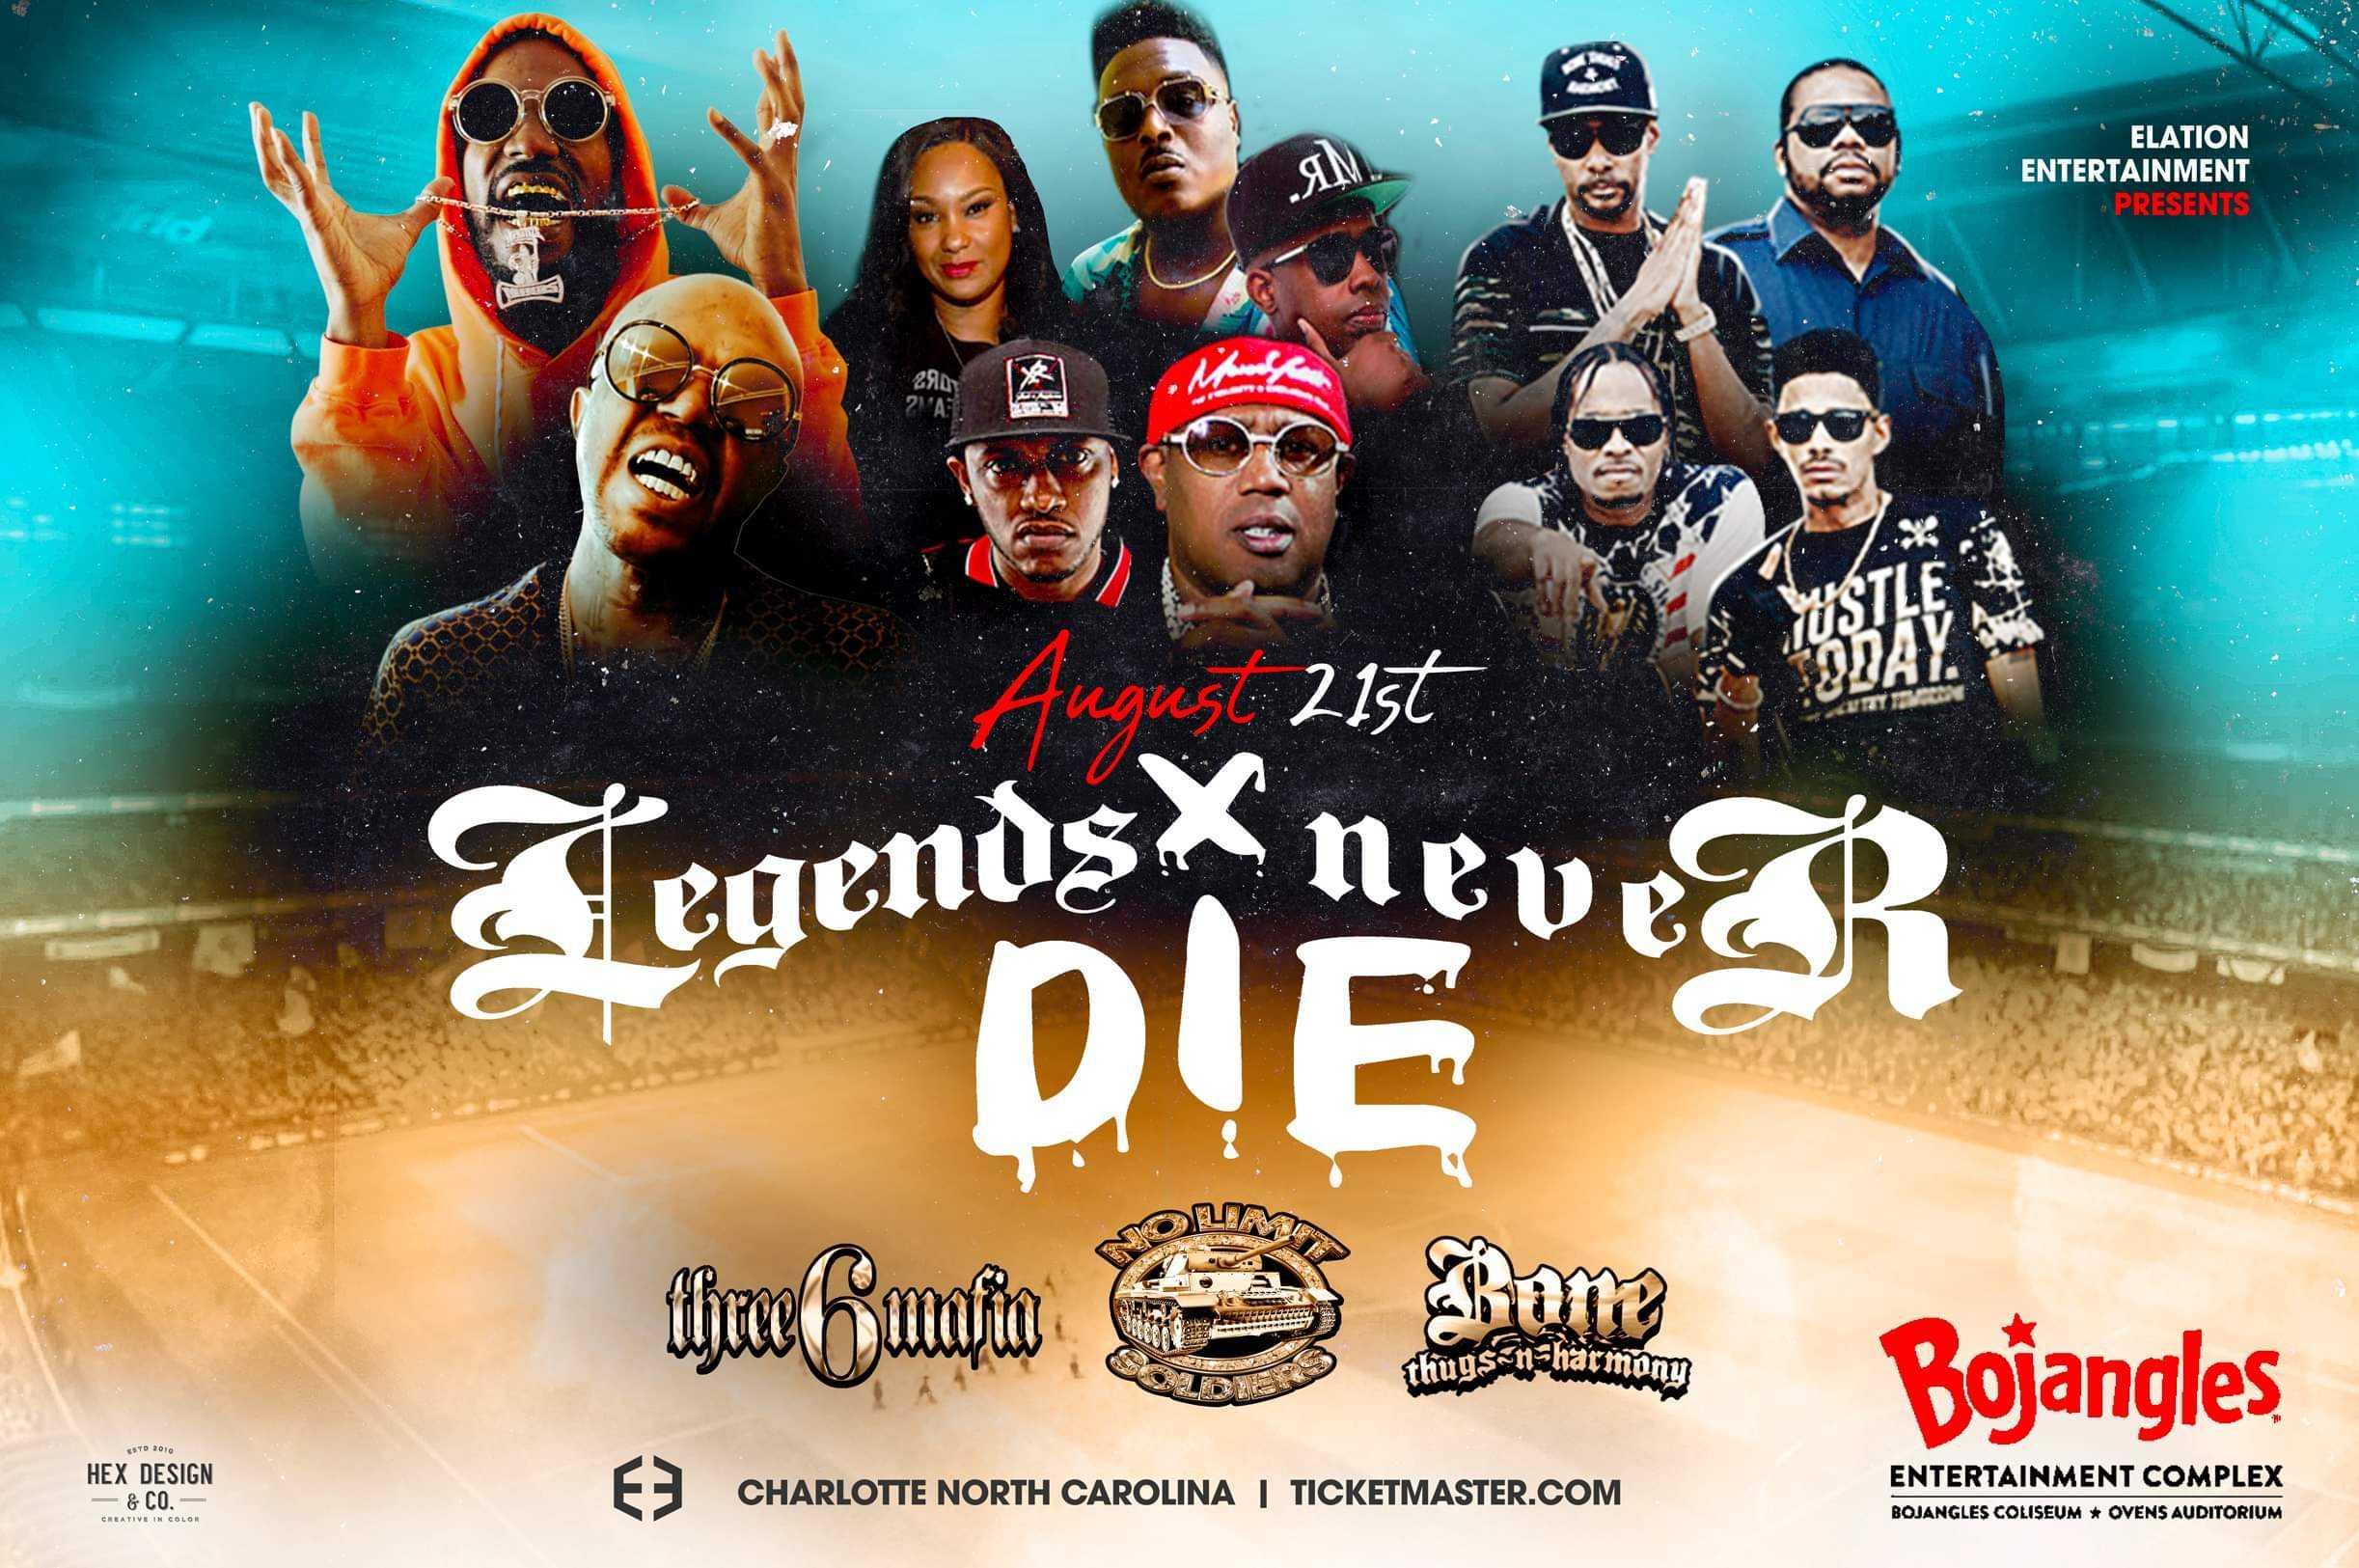 Elation Entertainment presents Legends Never Die (Canceled)